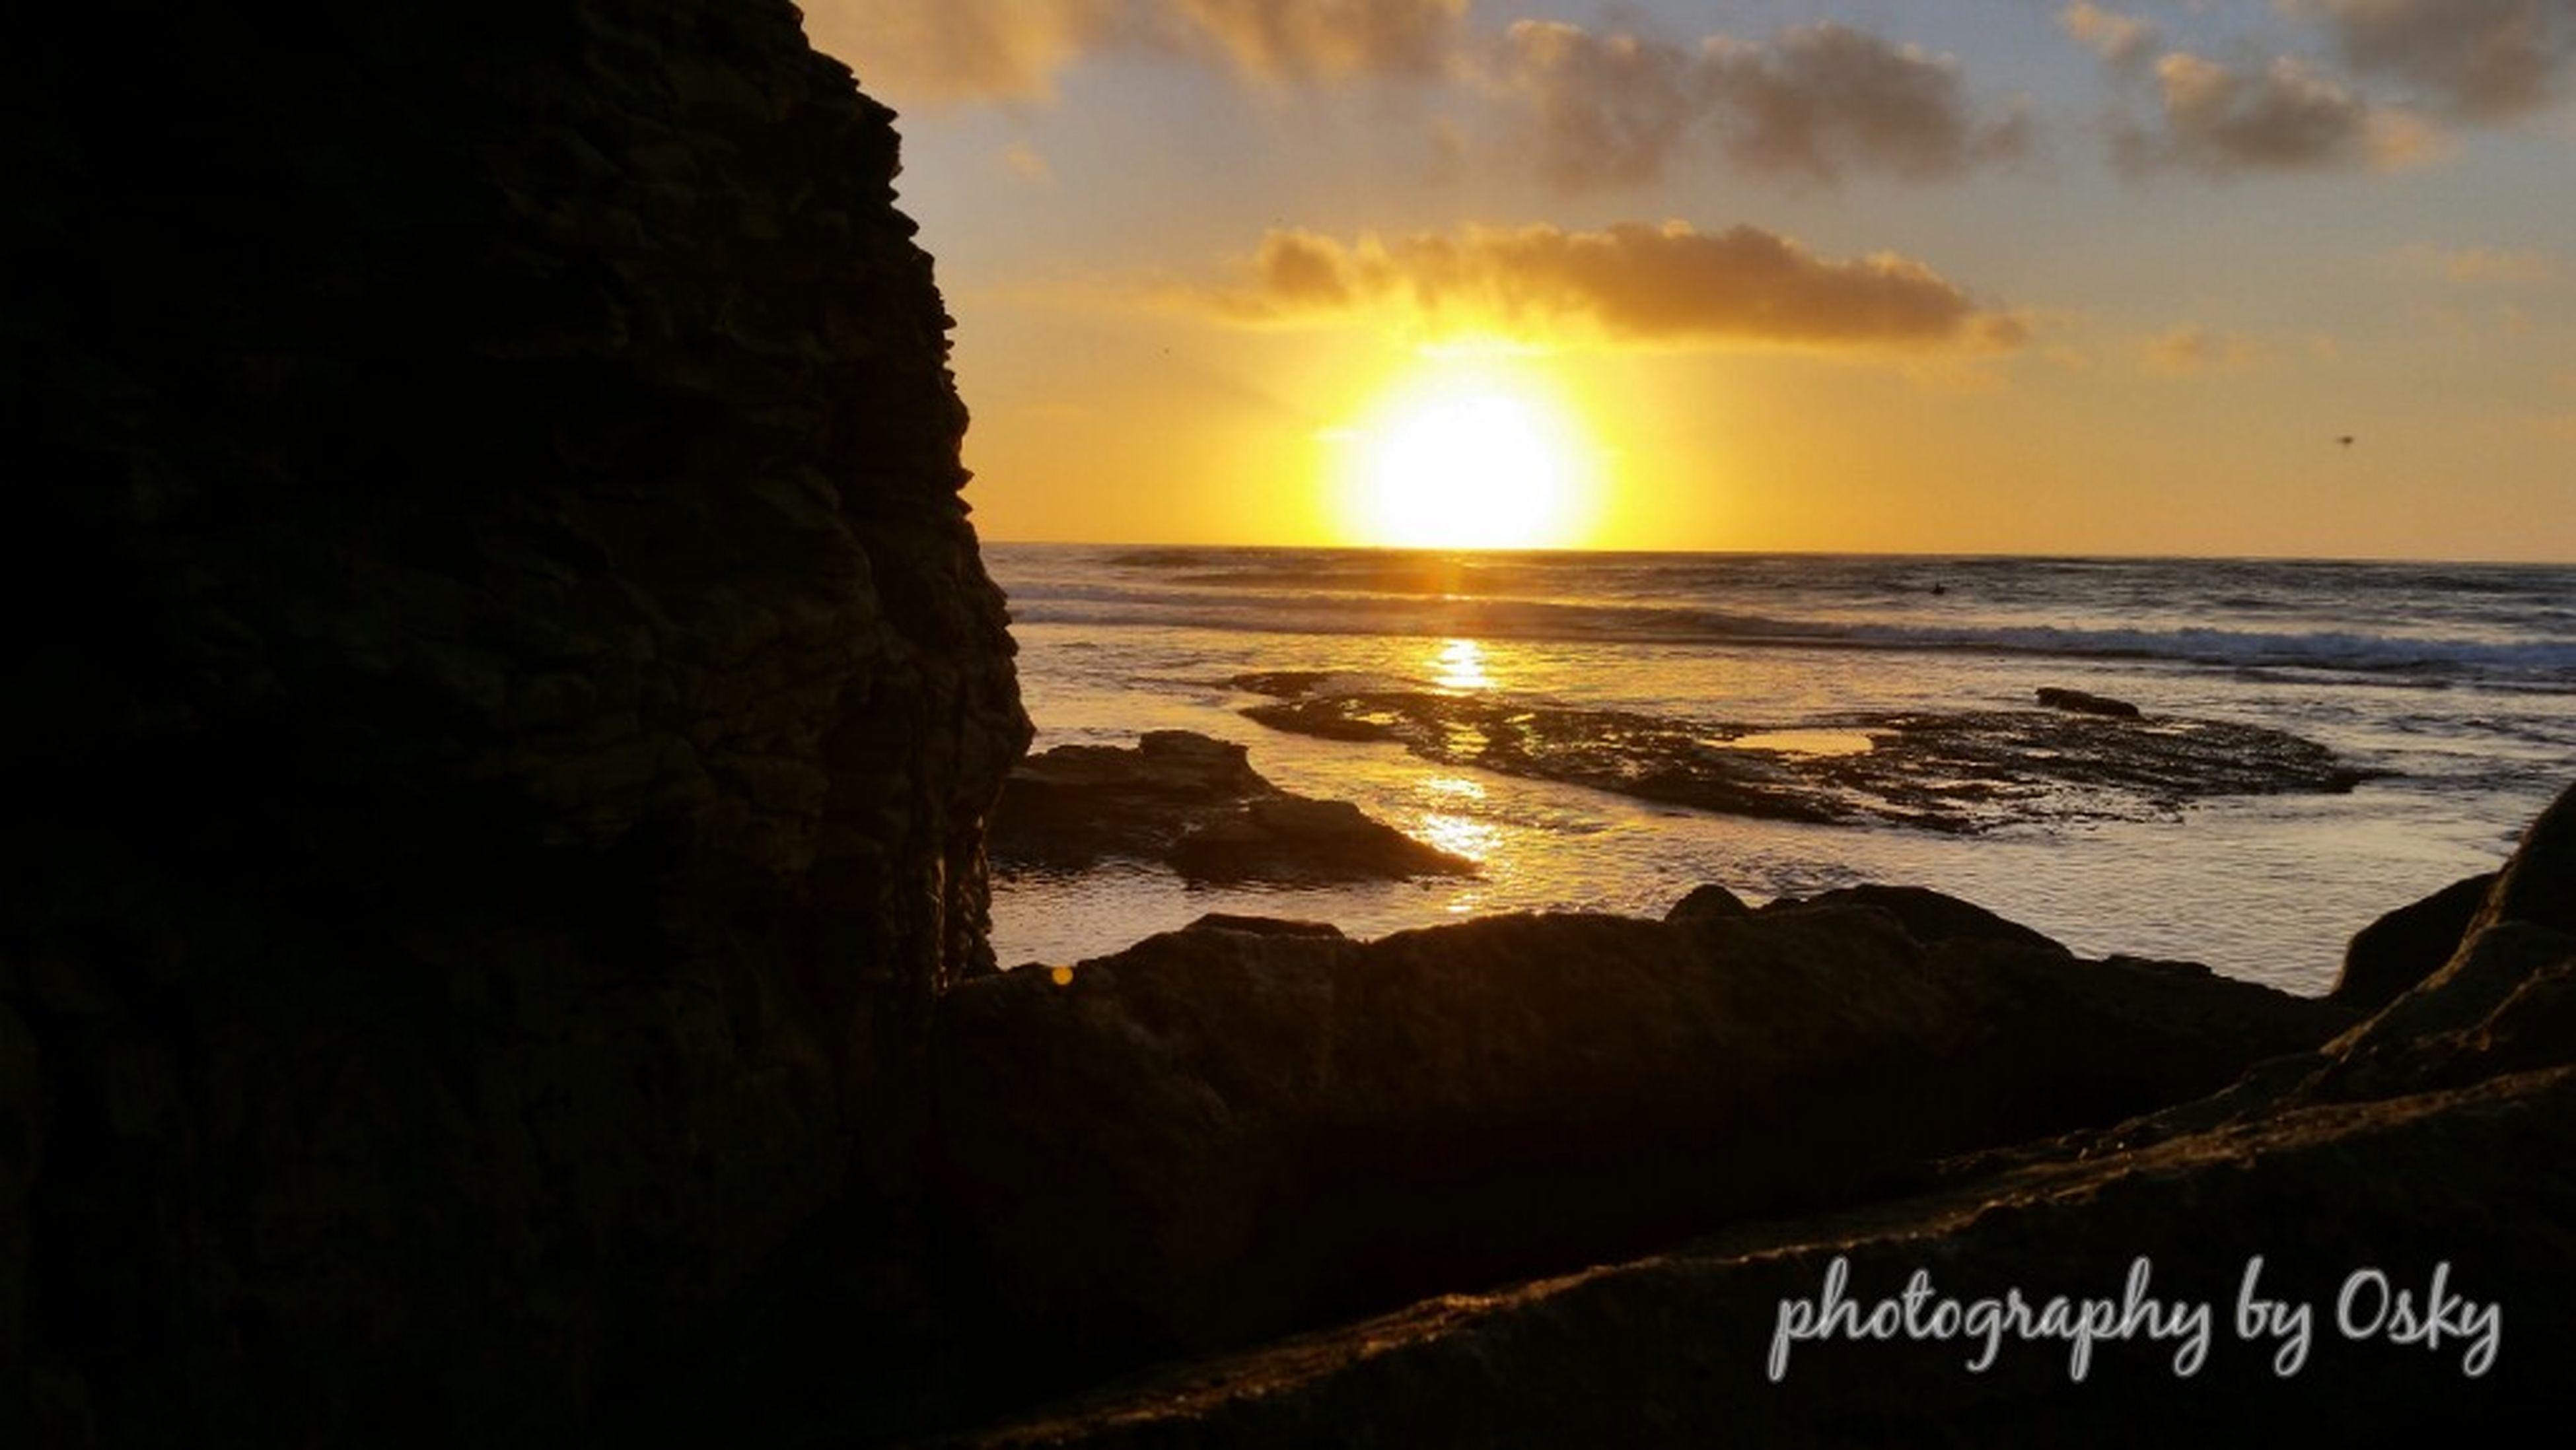 sunset, sea, horizon over water, water, scenics, tranquil scene, beauty in nature, tranquility, sky, beach, sun, shore, nature, orange color, idyllic, rock - object, cloud - sky, sunlight, remote, non-urban scene